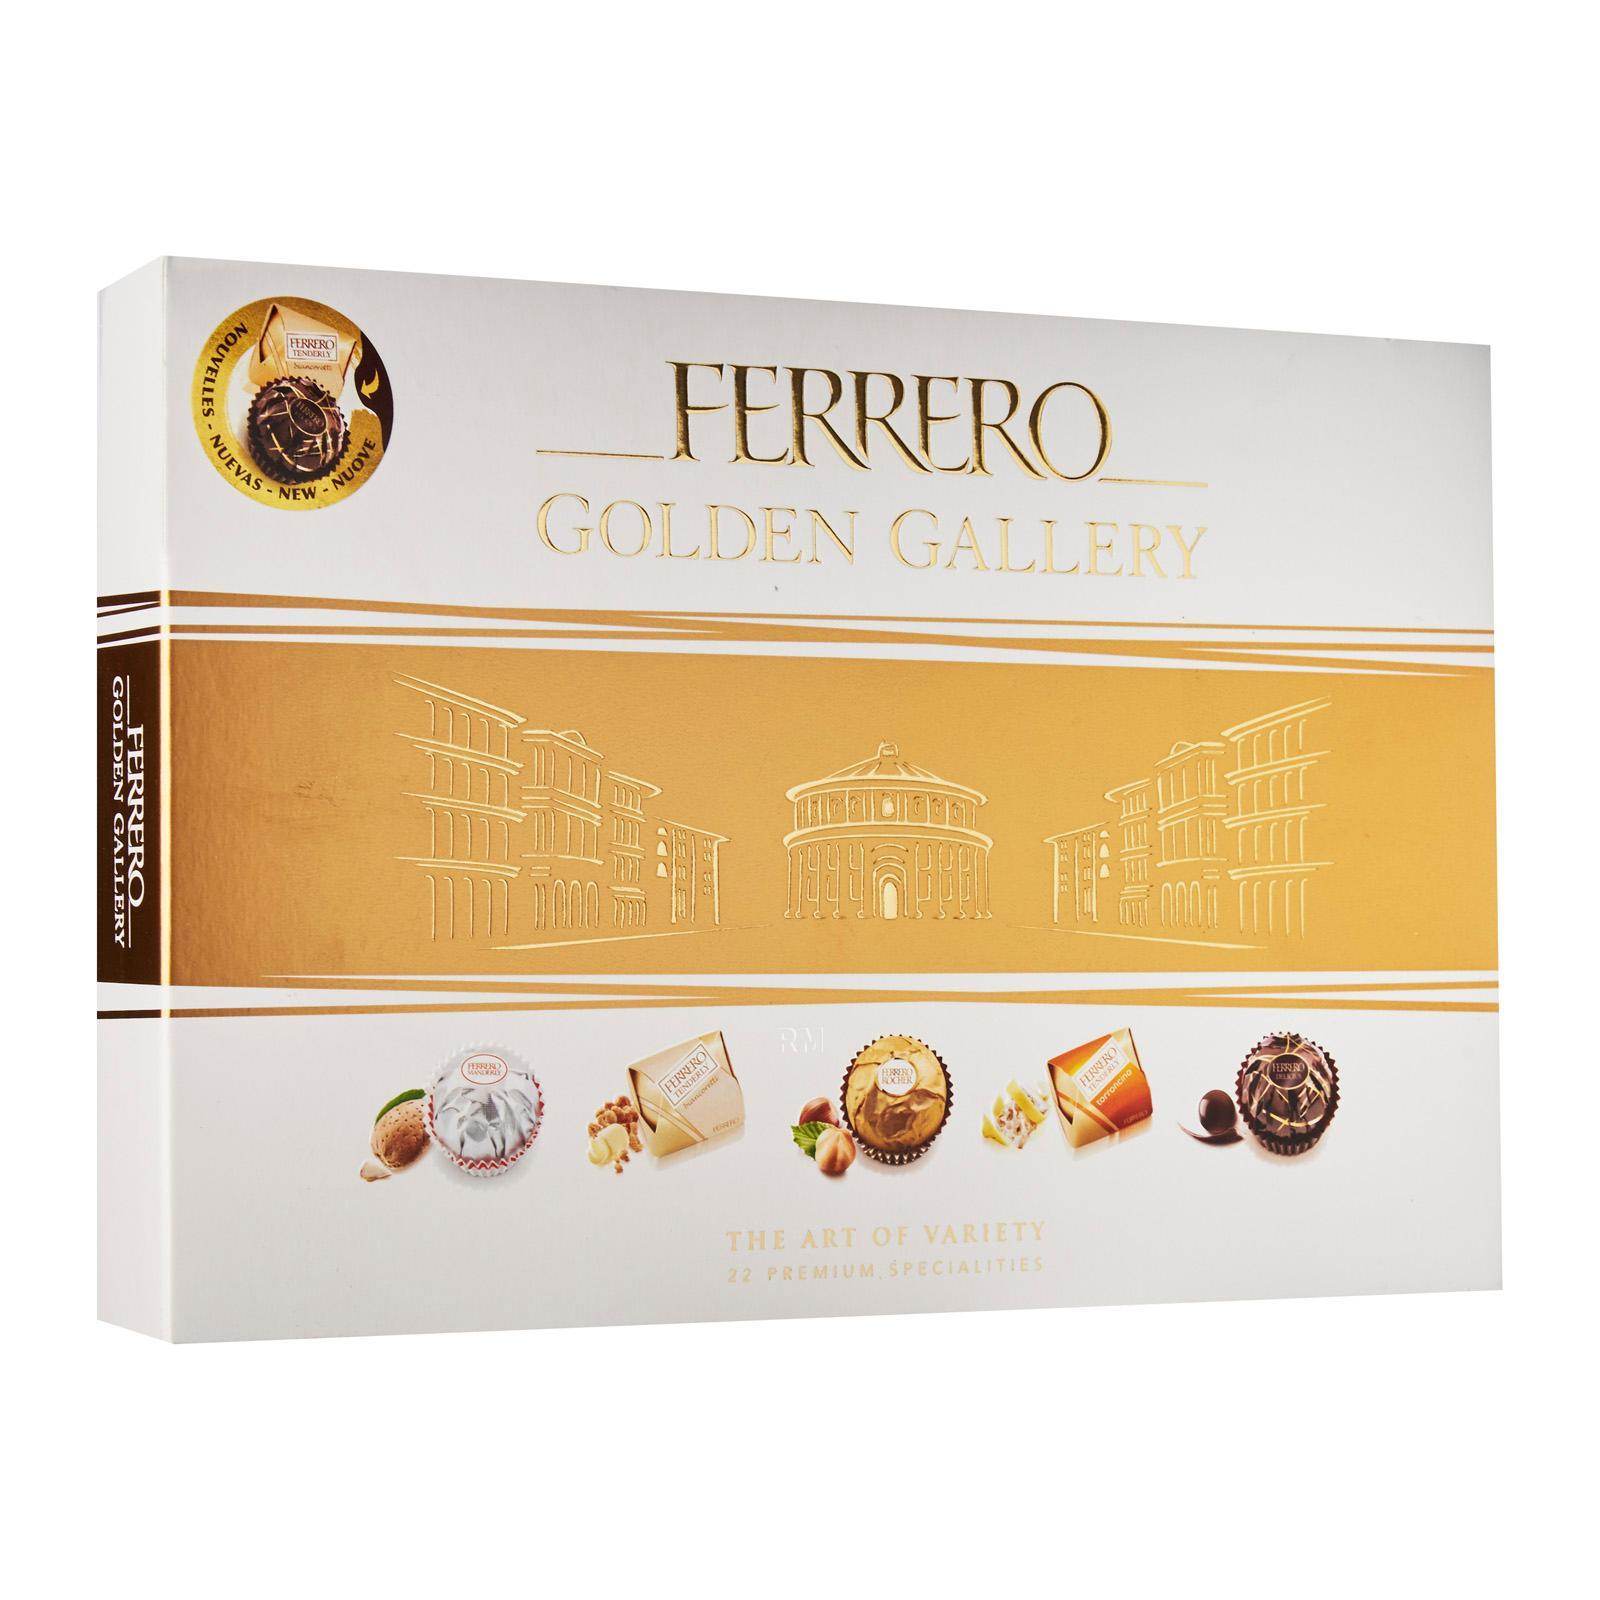 Ferrero Rocher Golden Gallery Collection Chocolates - Christmas Special